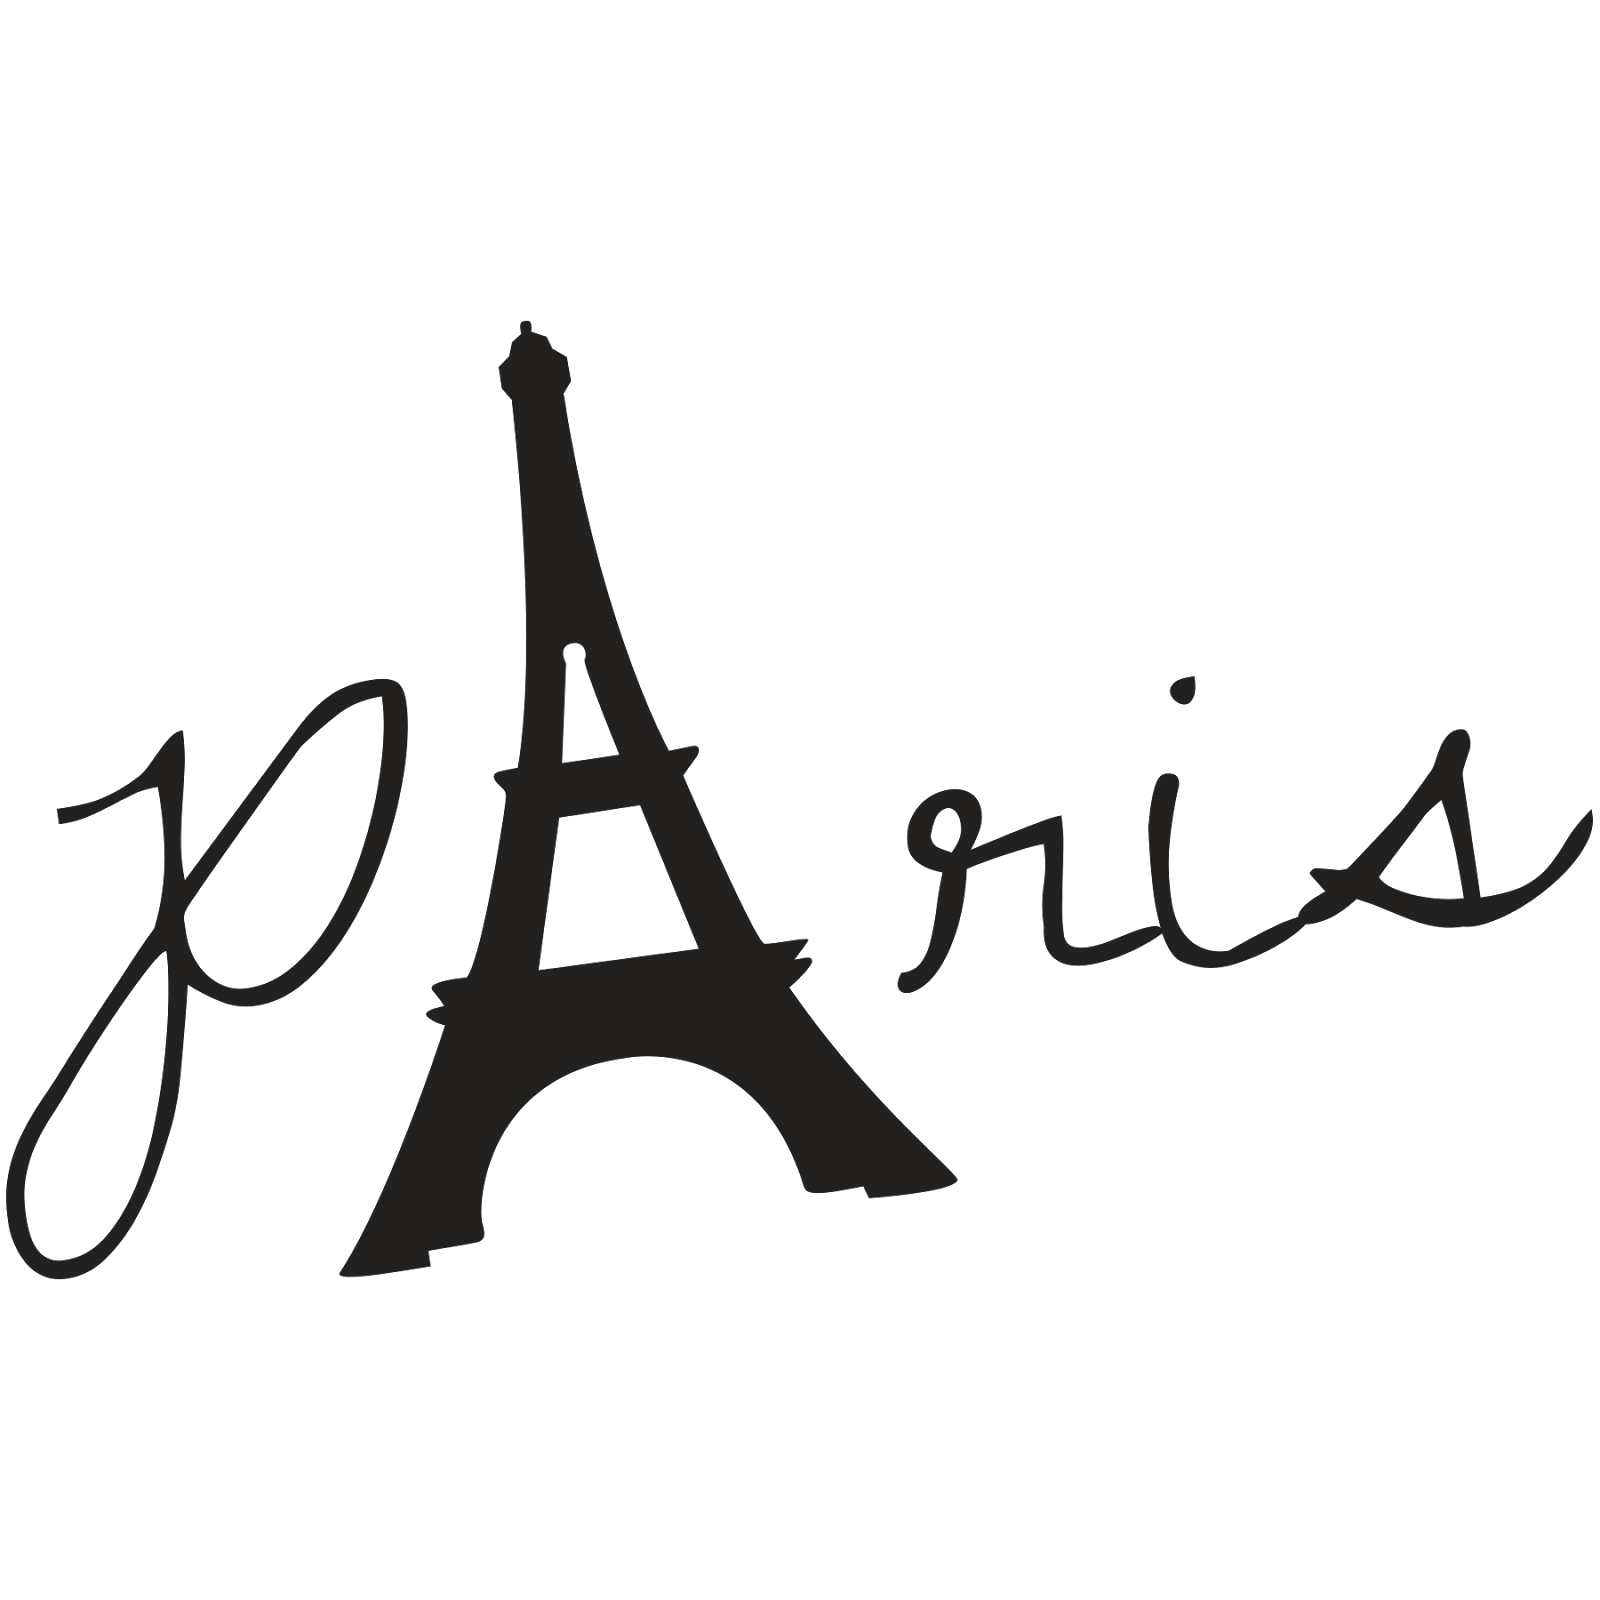 Y Paris Clipart